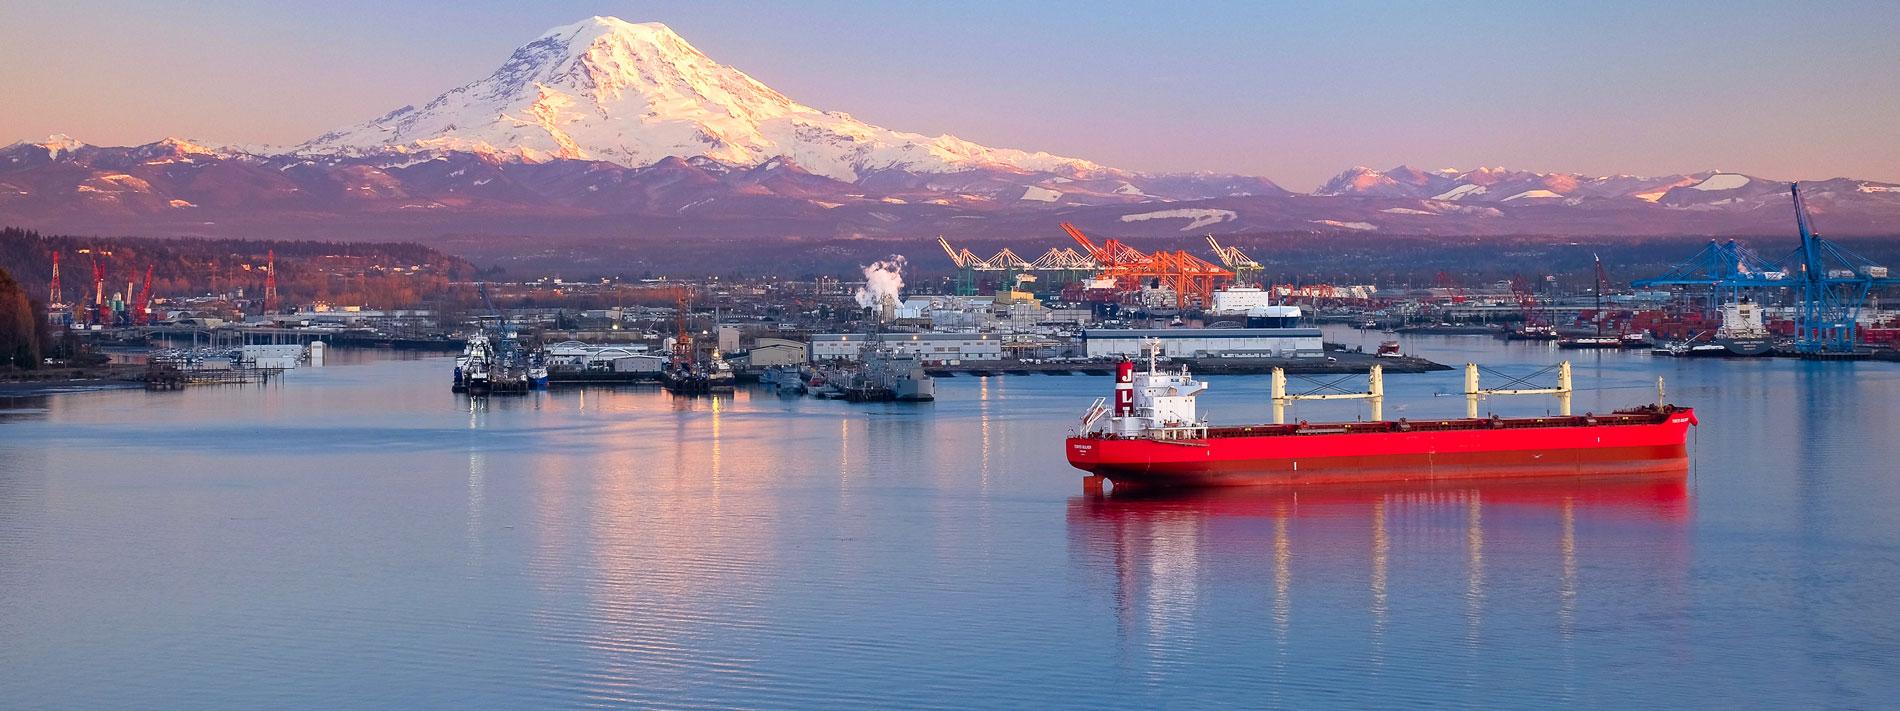 boats on dock outside of Tacoma, Washington